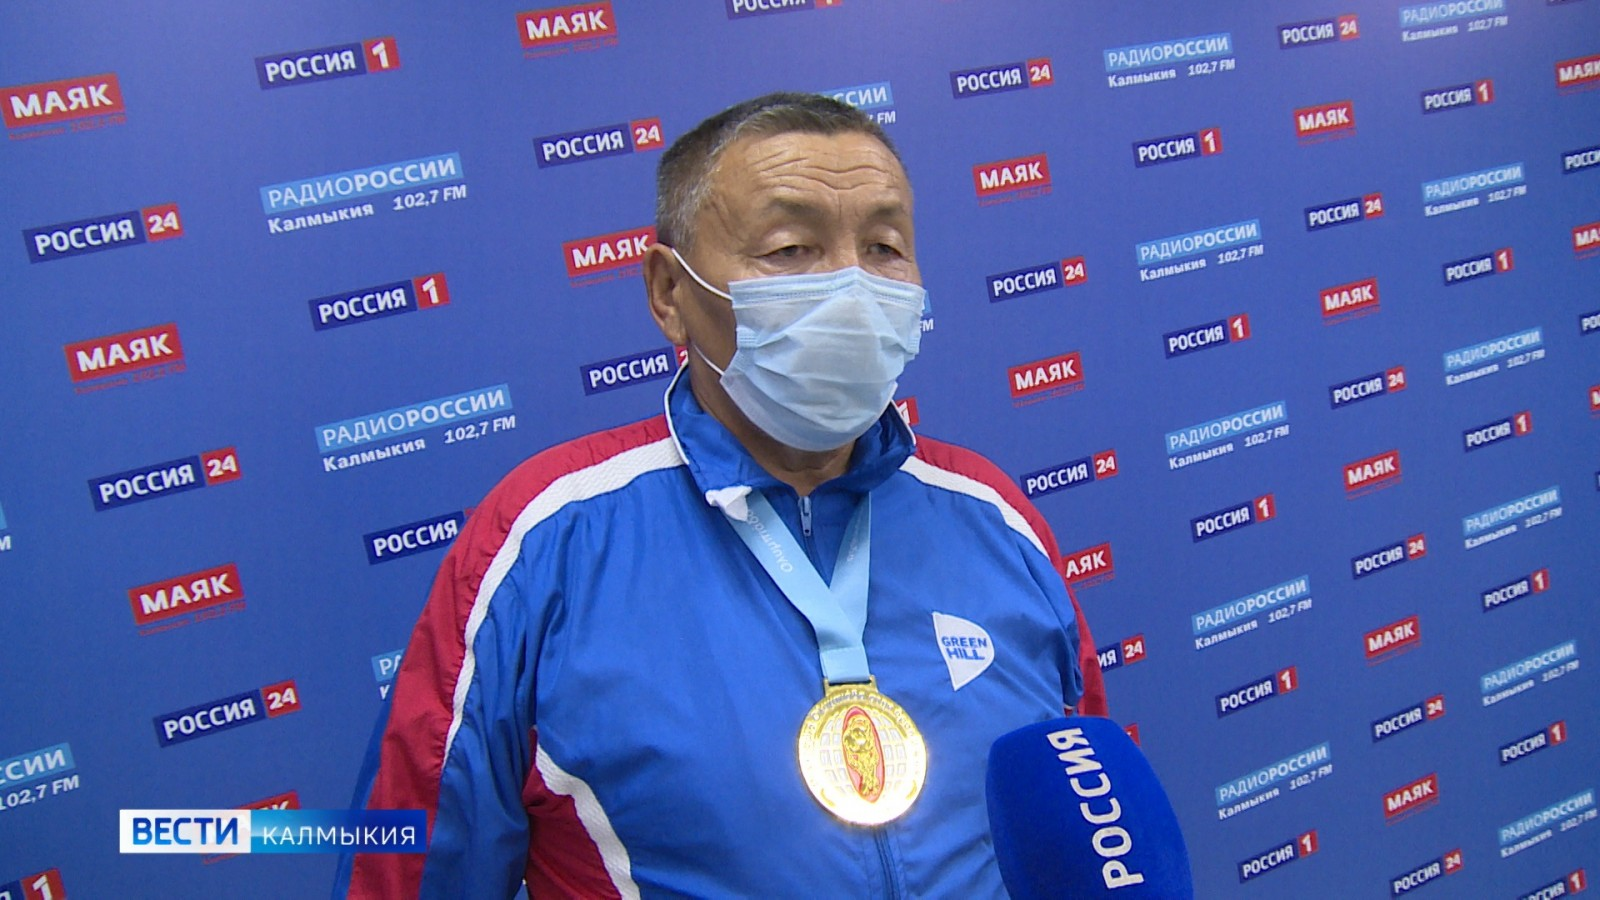 Вячеслав Эрднеев – Чемпион Международного турнира по гиревому спорту